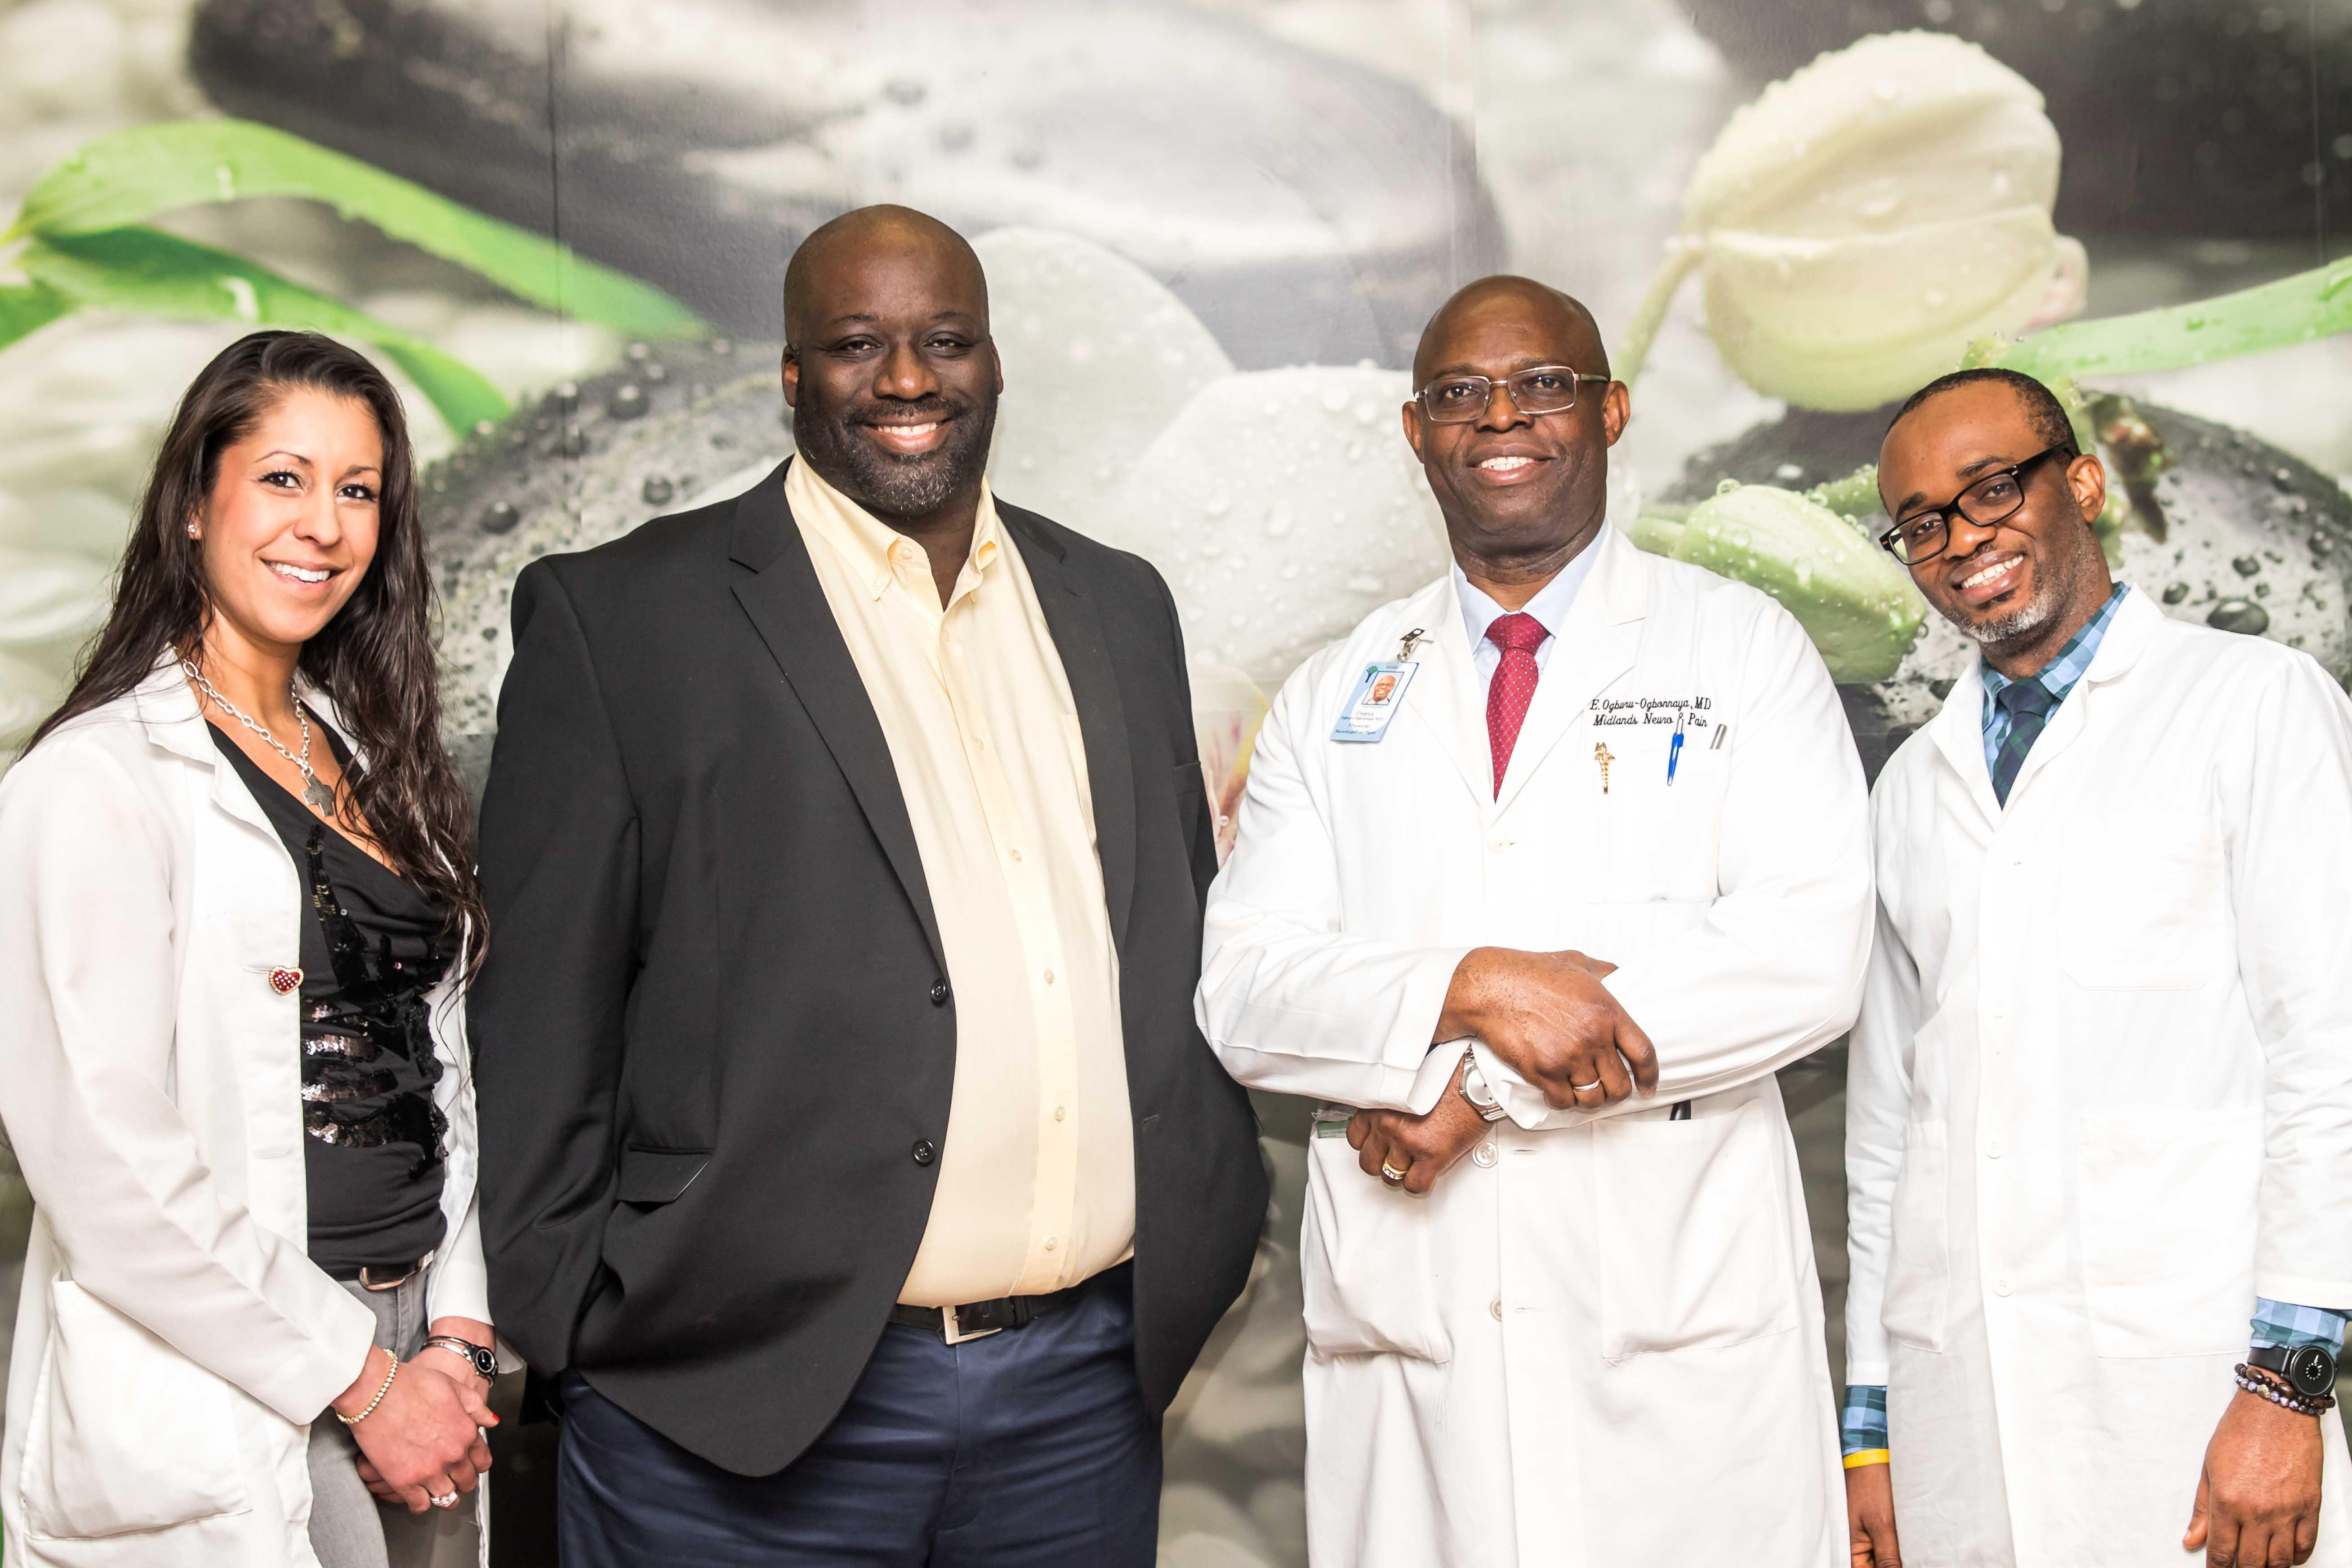 Midlands Neurology & Pain Associates, P A  – The world leader in